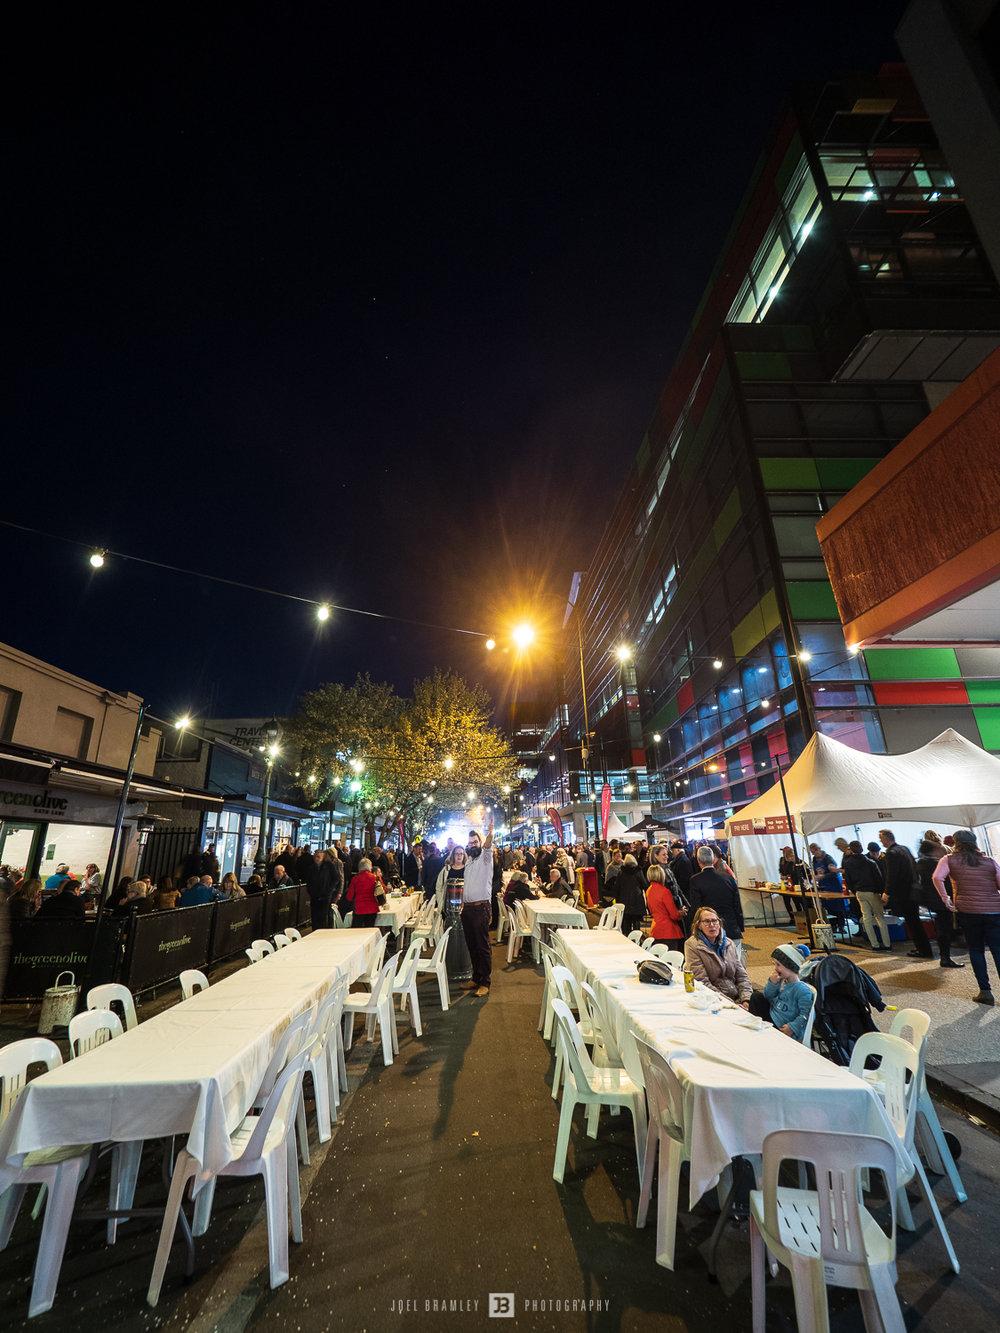 cbnc-street-party-29.jpg